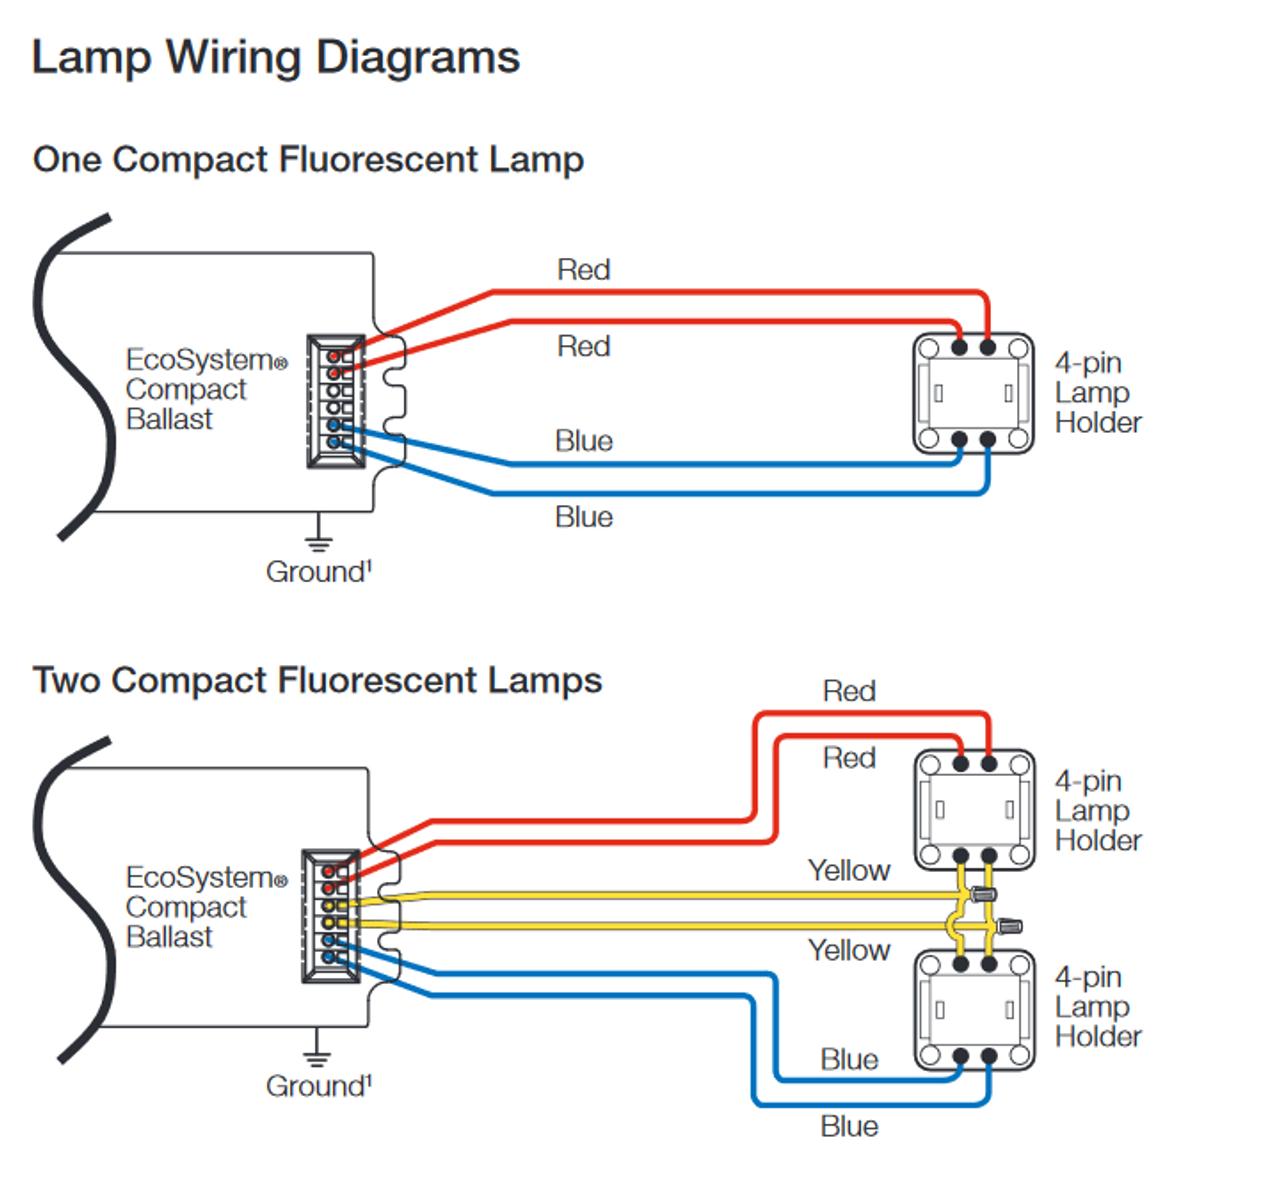 Lutron Ariadni Wiring Diagram S2L Lutron Dimmer Switch Wiring ... on lutron c.l. dimmer, control4 dimmer wiring-diagram, lutron dimmers led, lutron diva dimmer, lutron dimming ballast wiring diagram, lutron nf 10 wiring diagram, leviton dimmer wiring-diagram, led dimmer wiring-diagram, lutron occupancy sensor wiring diagram, lutron 3-way dimmer switch, three-way dimmer wiring-diagram, lutron hi-lume led driver, light dimmer wiring-diagram, lutron dimmer installation, lutron ma 600 wiring diagram, lutron slide dimmer, lutron light dimmer, lutron ntf 10 wiring diagram, lutron macl-153m diagram, lutron homeworks wiring diagram,